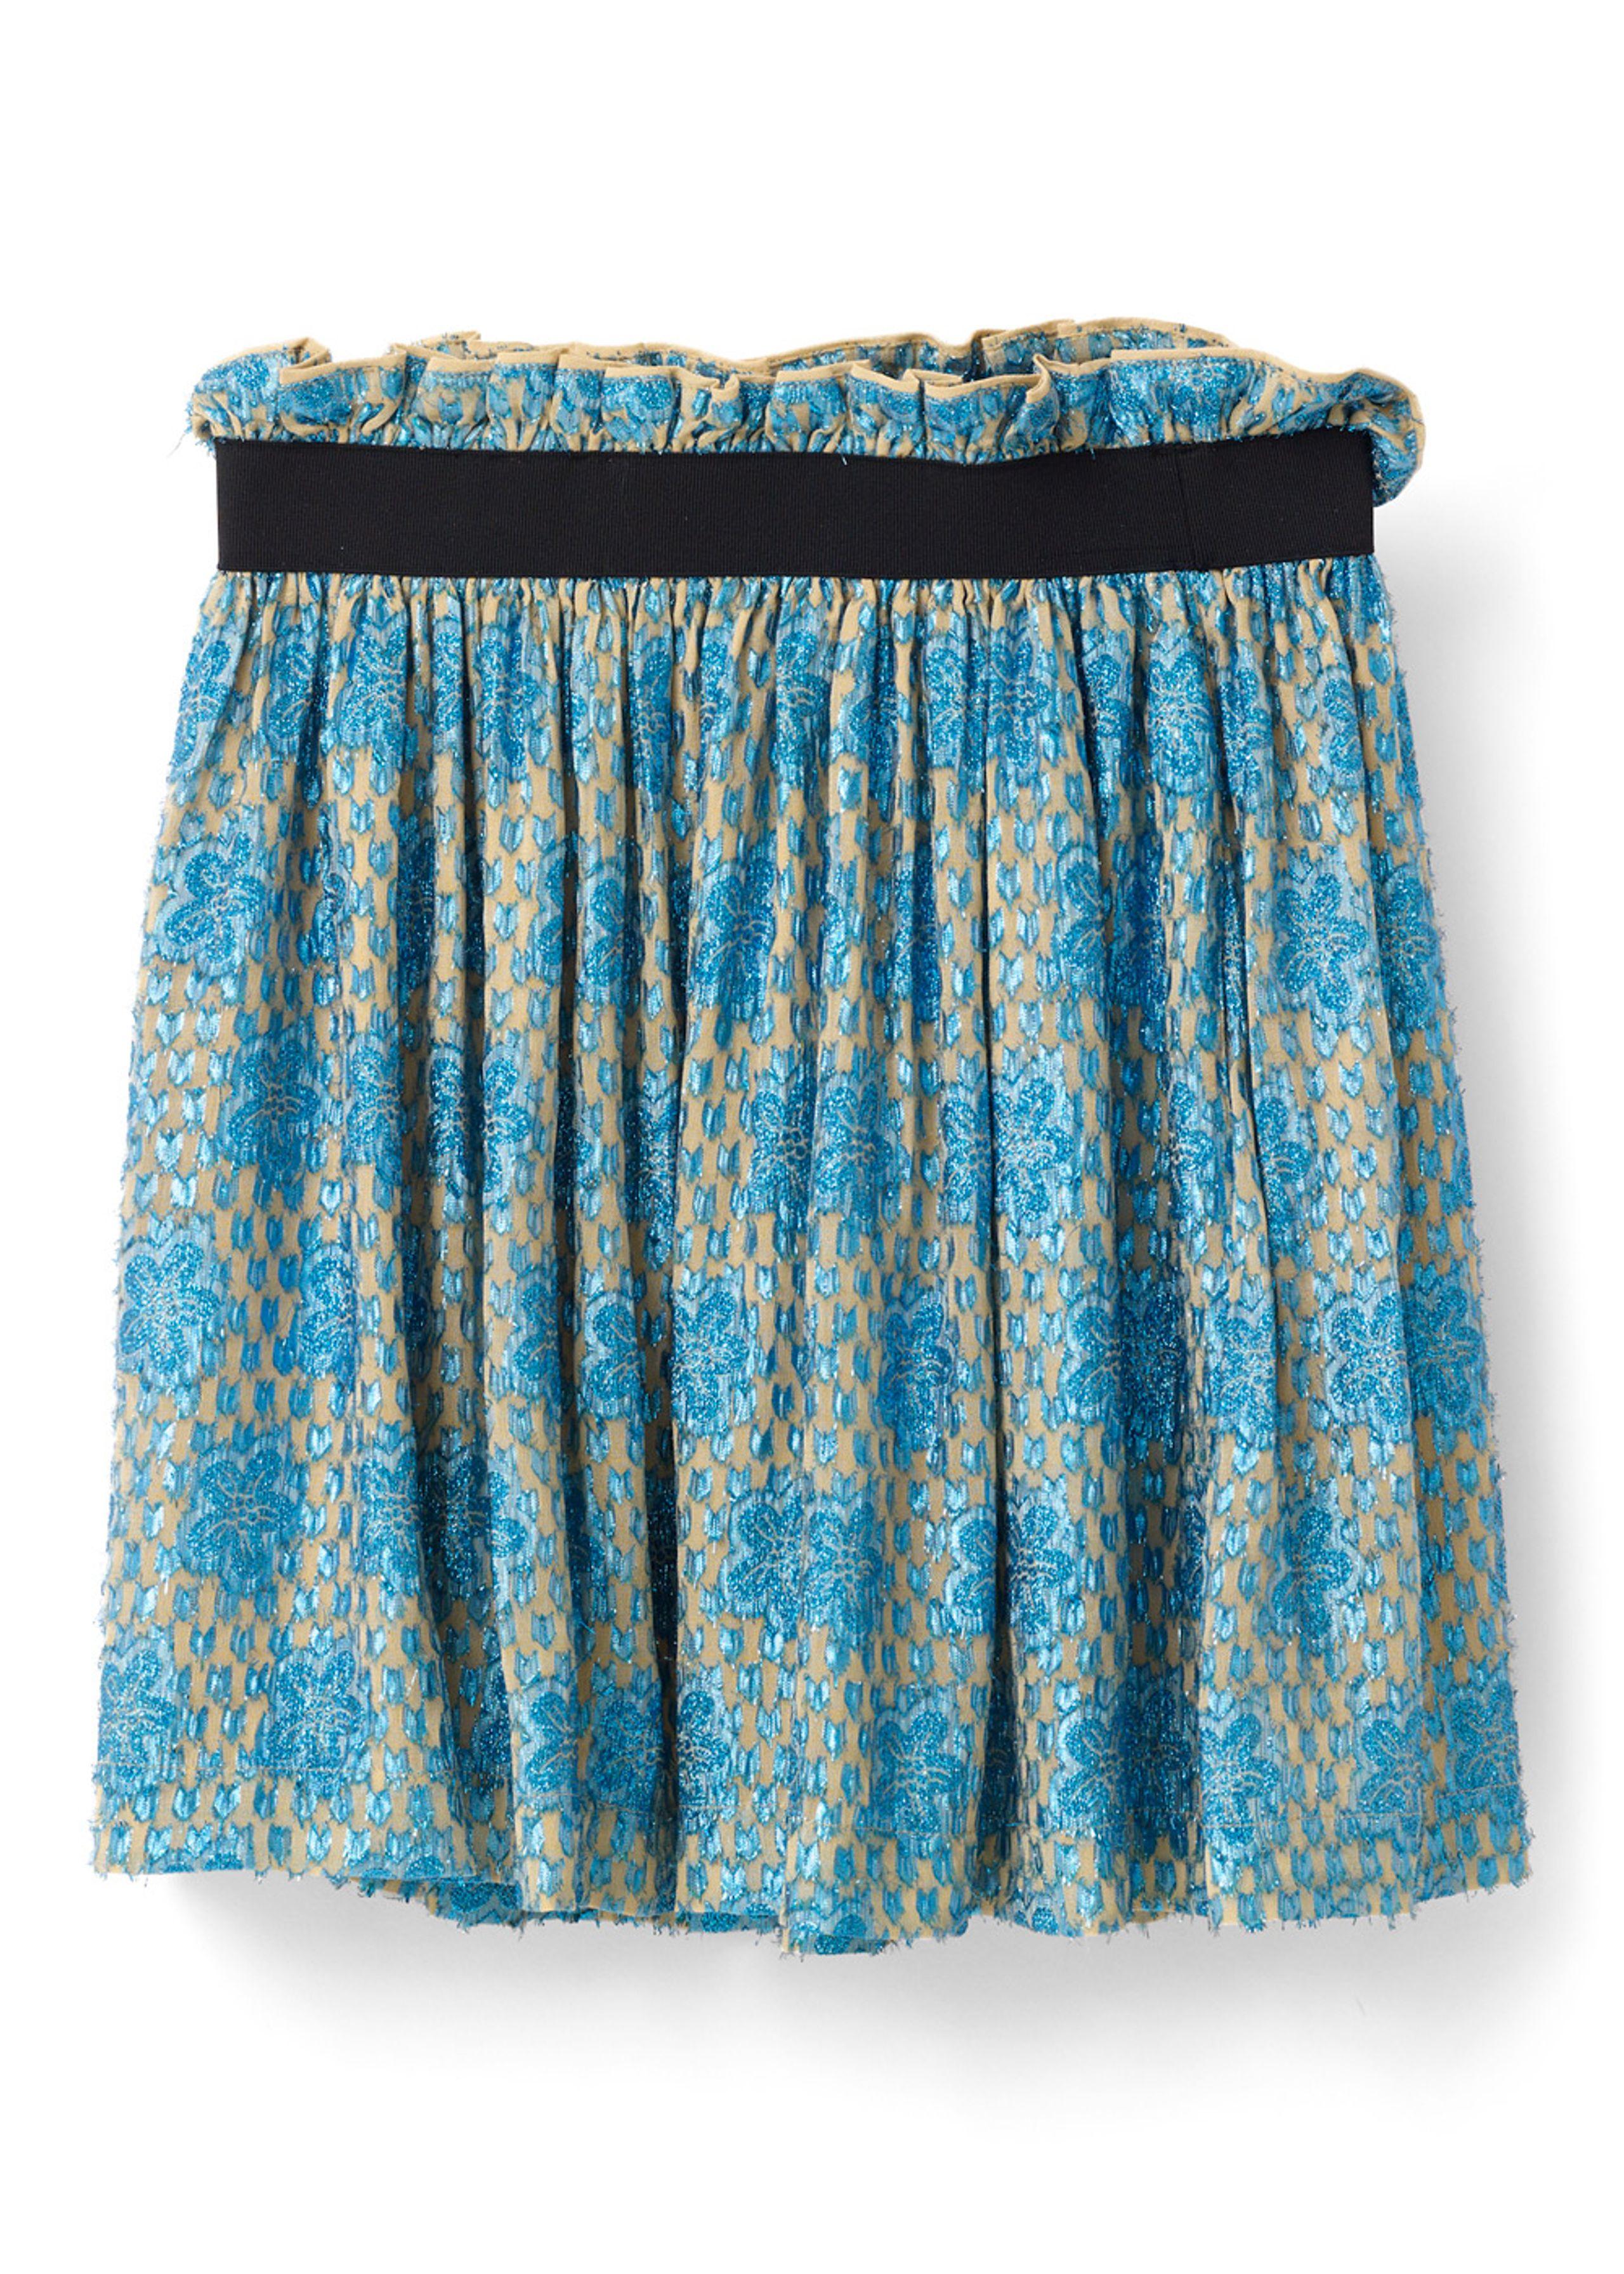 Image of   Emiko Sequins Skirt